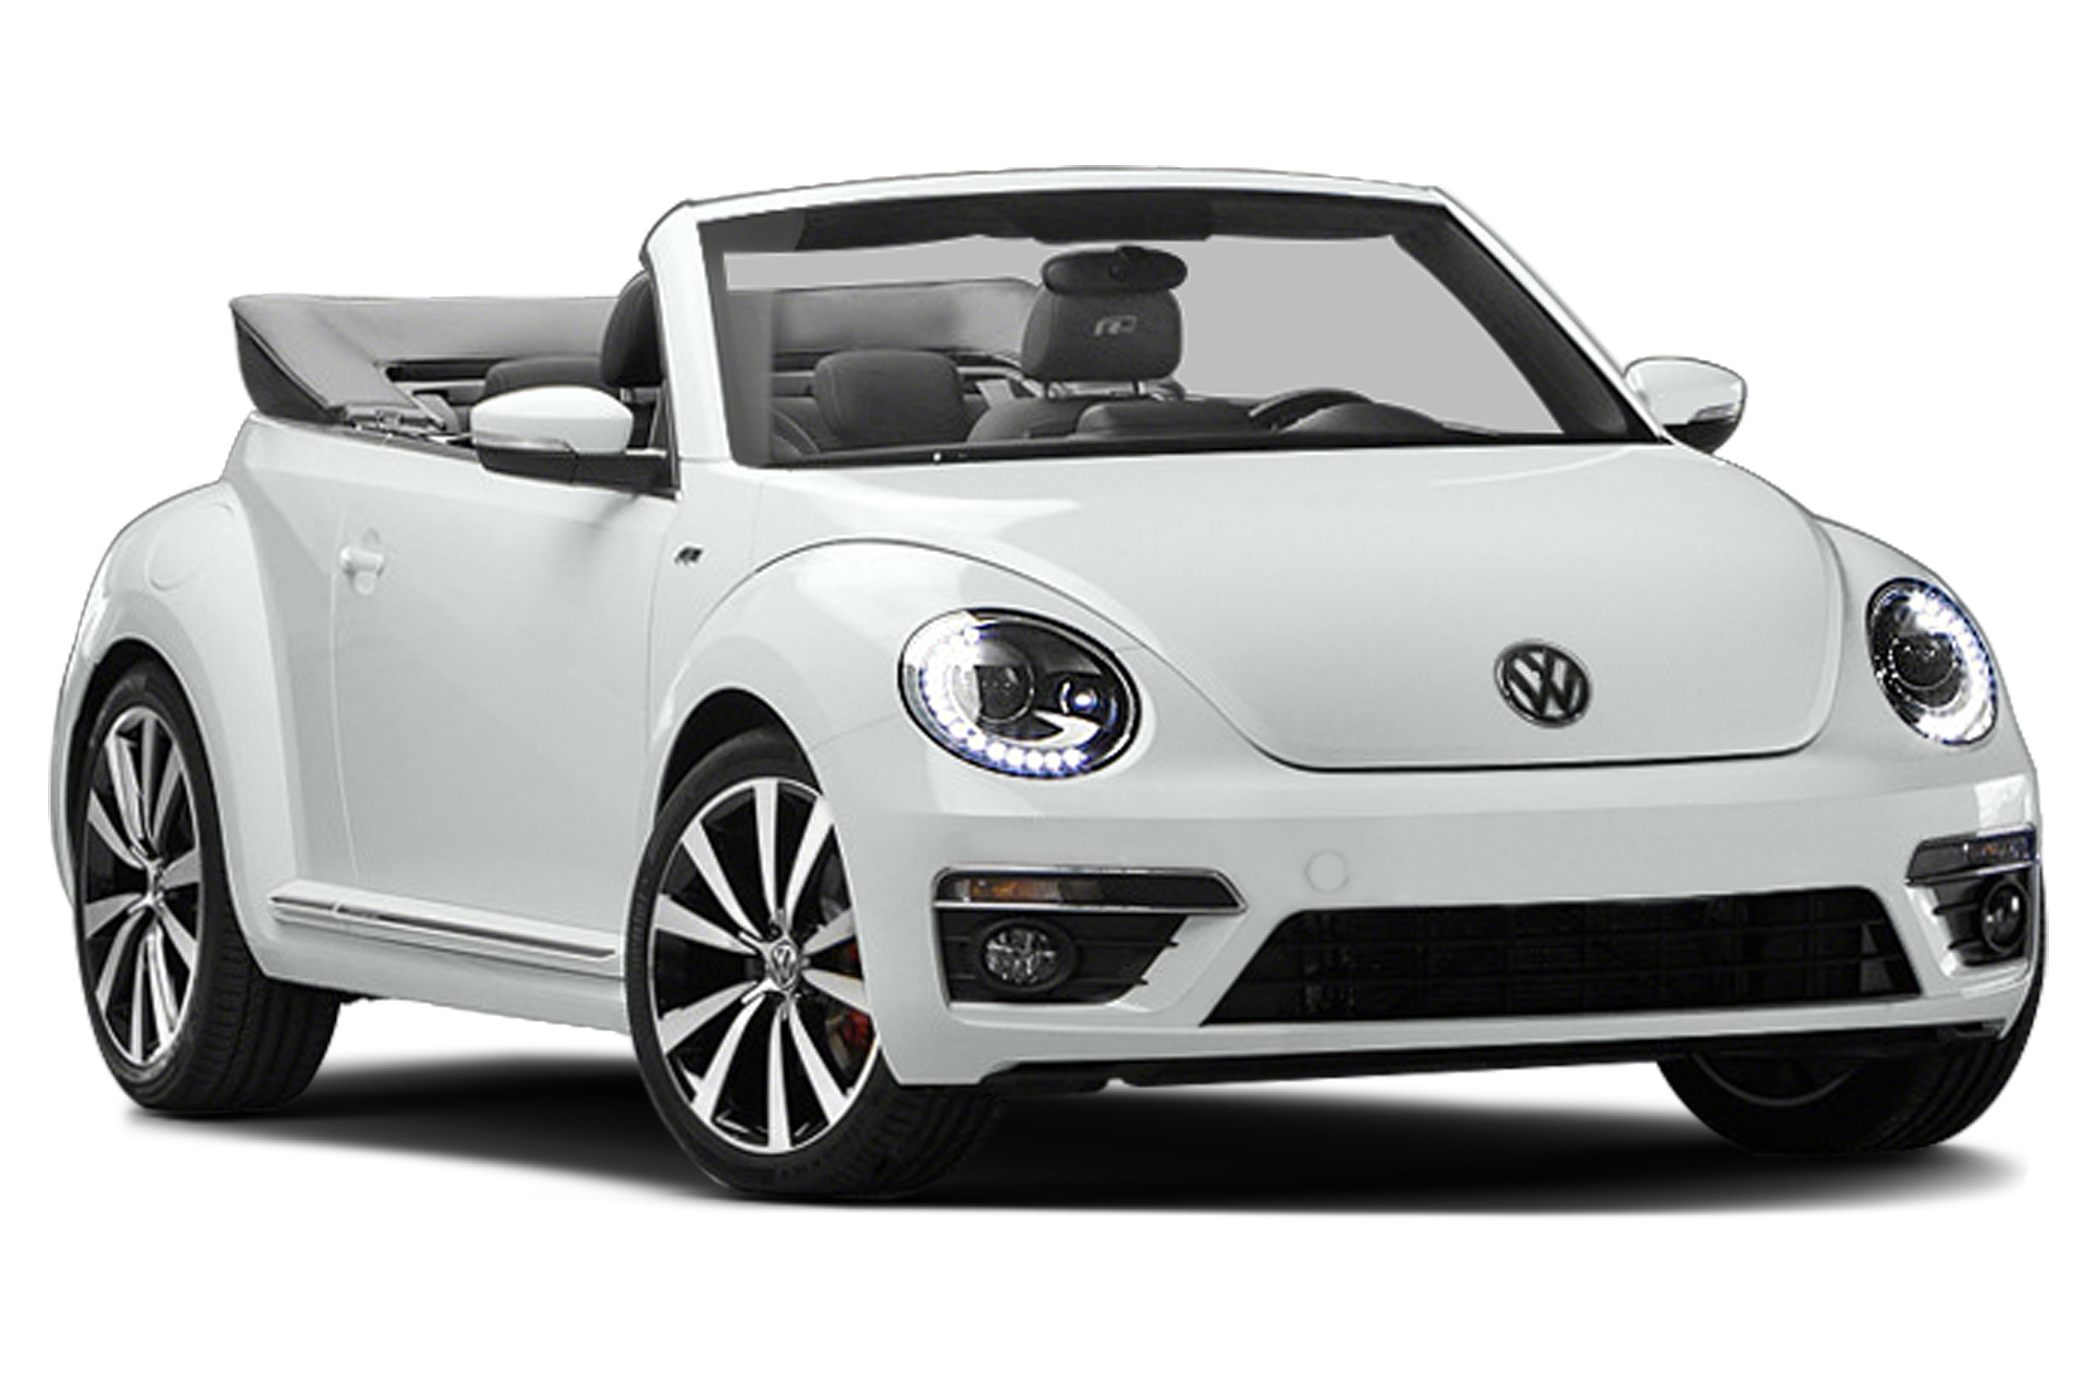 2016 Volkswagen Beetle R Line S 2dr Convertible For Sale